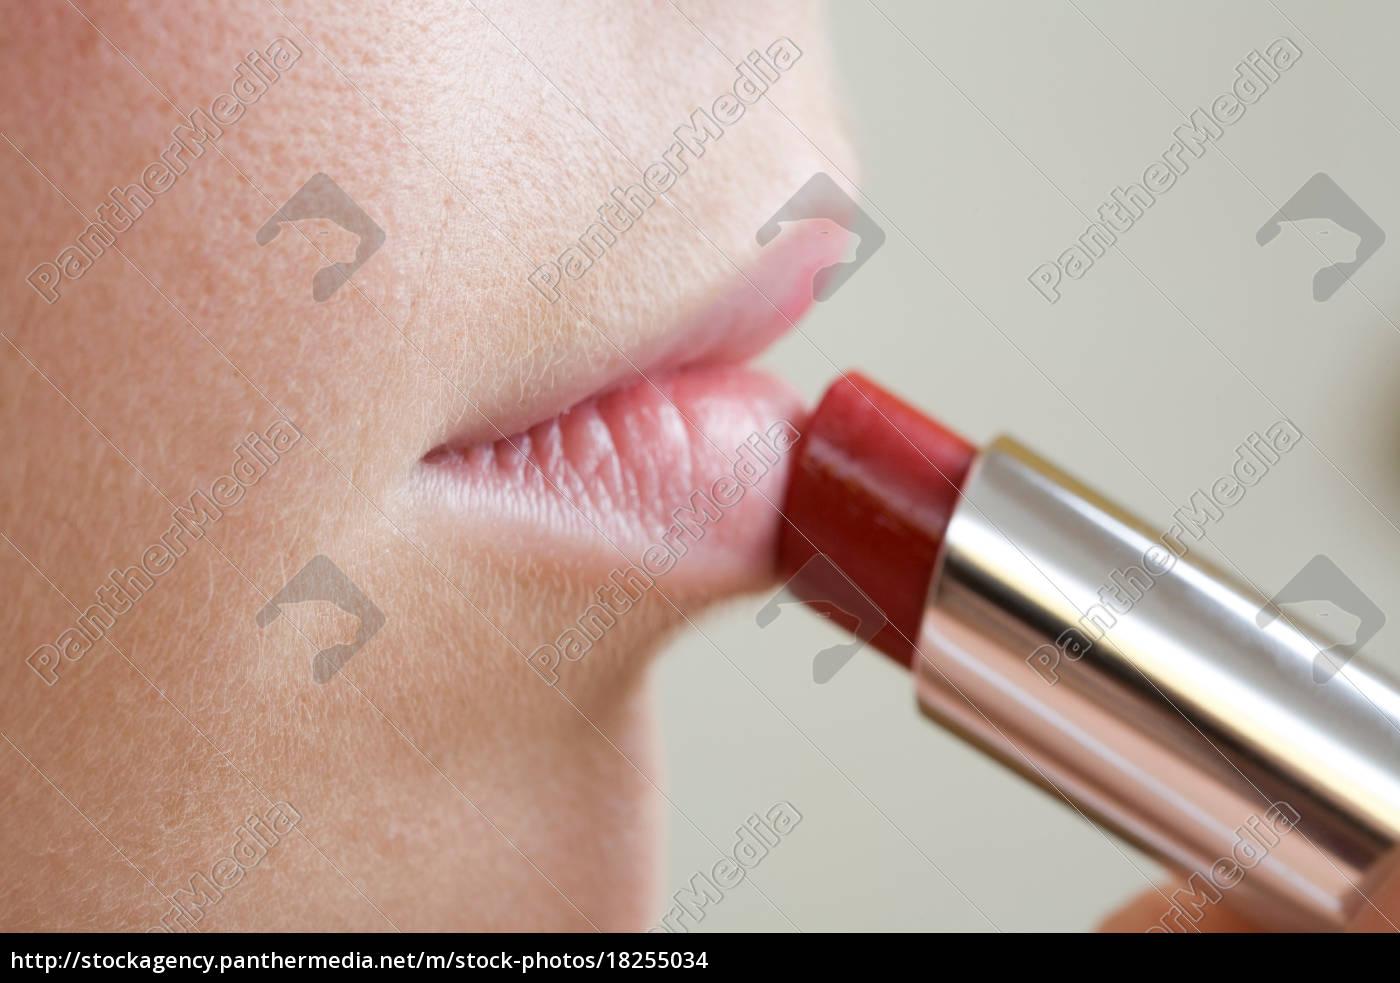 close, up, of, woman, applying, lipstick - 18255034